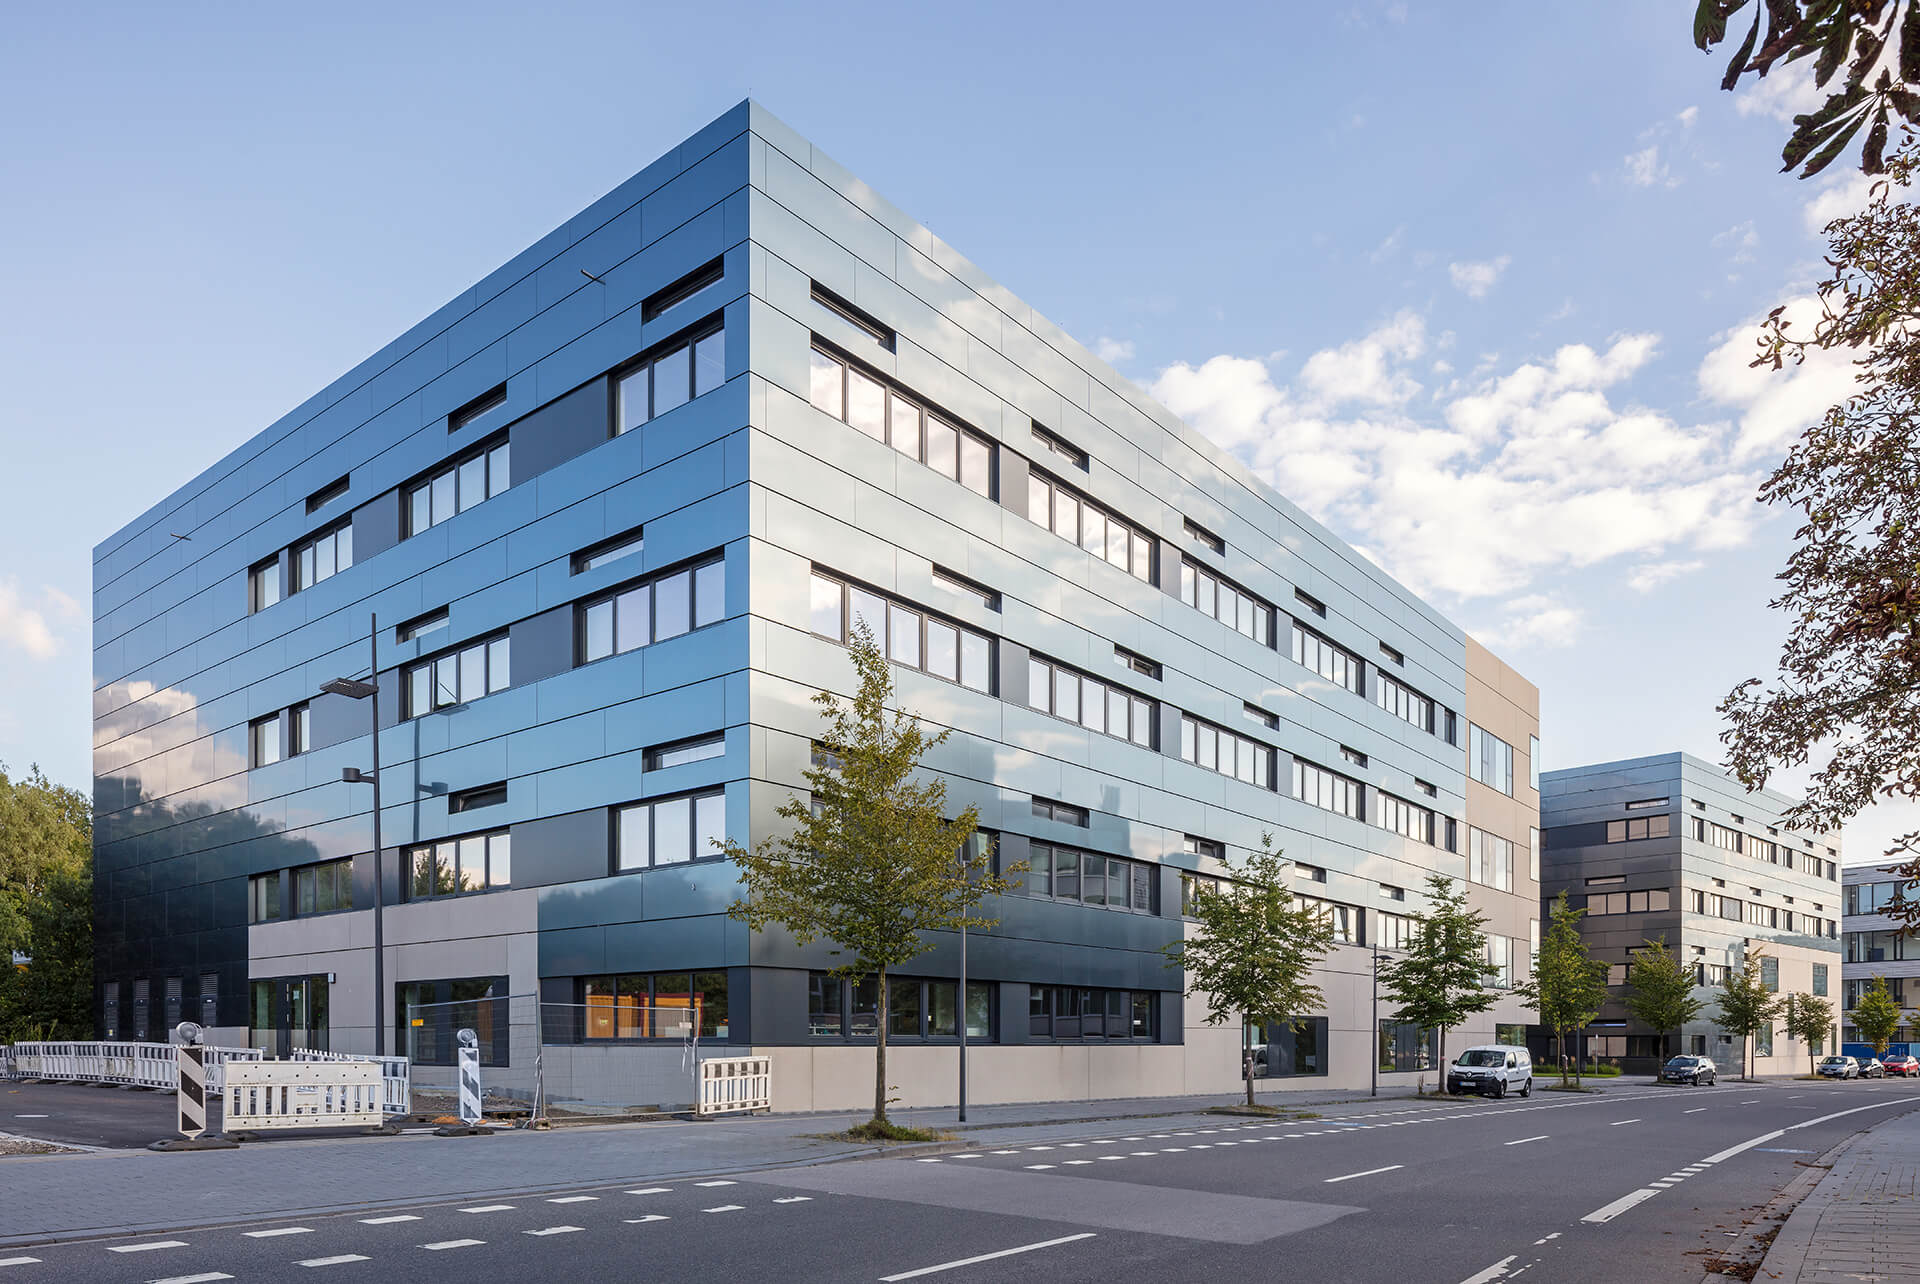 Architekten Aachen ksg architekten ngp aachen